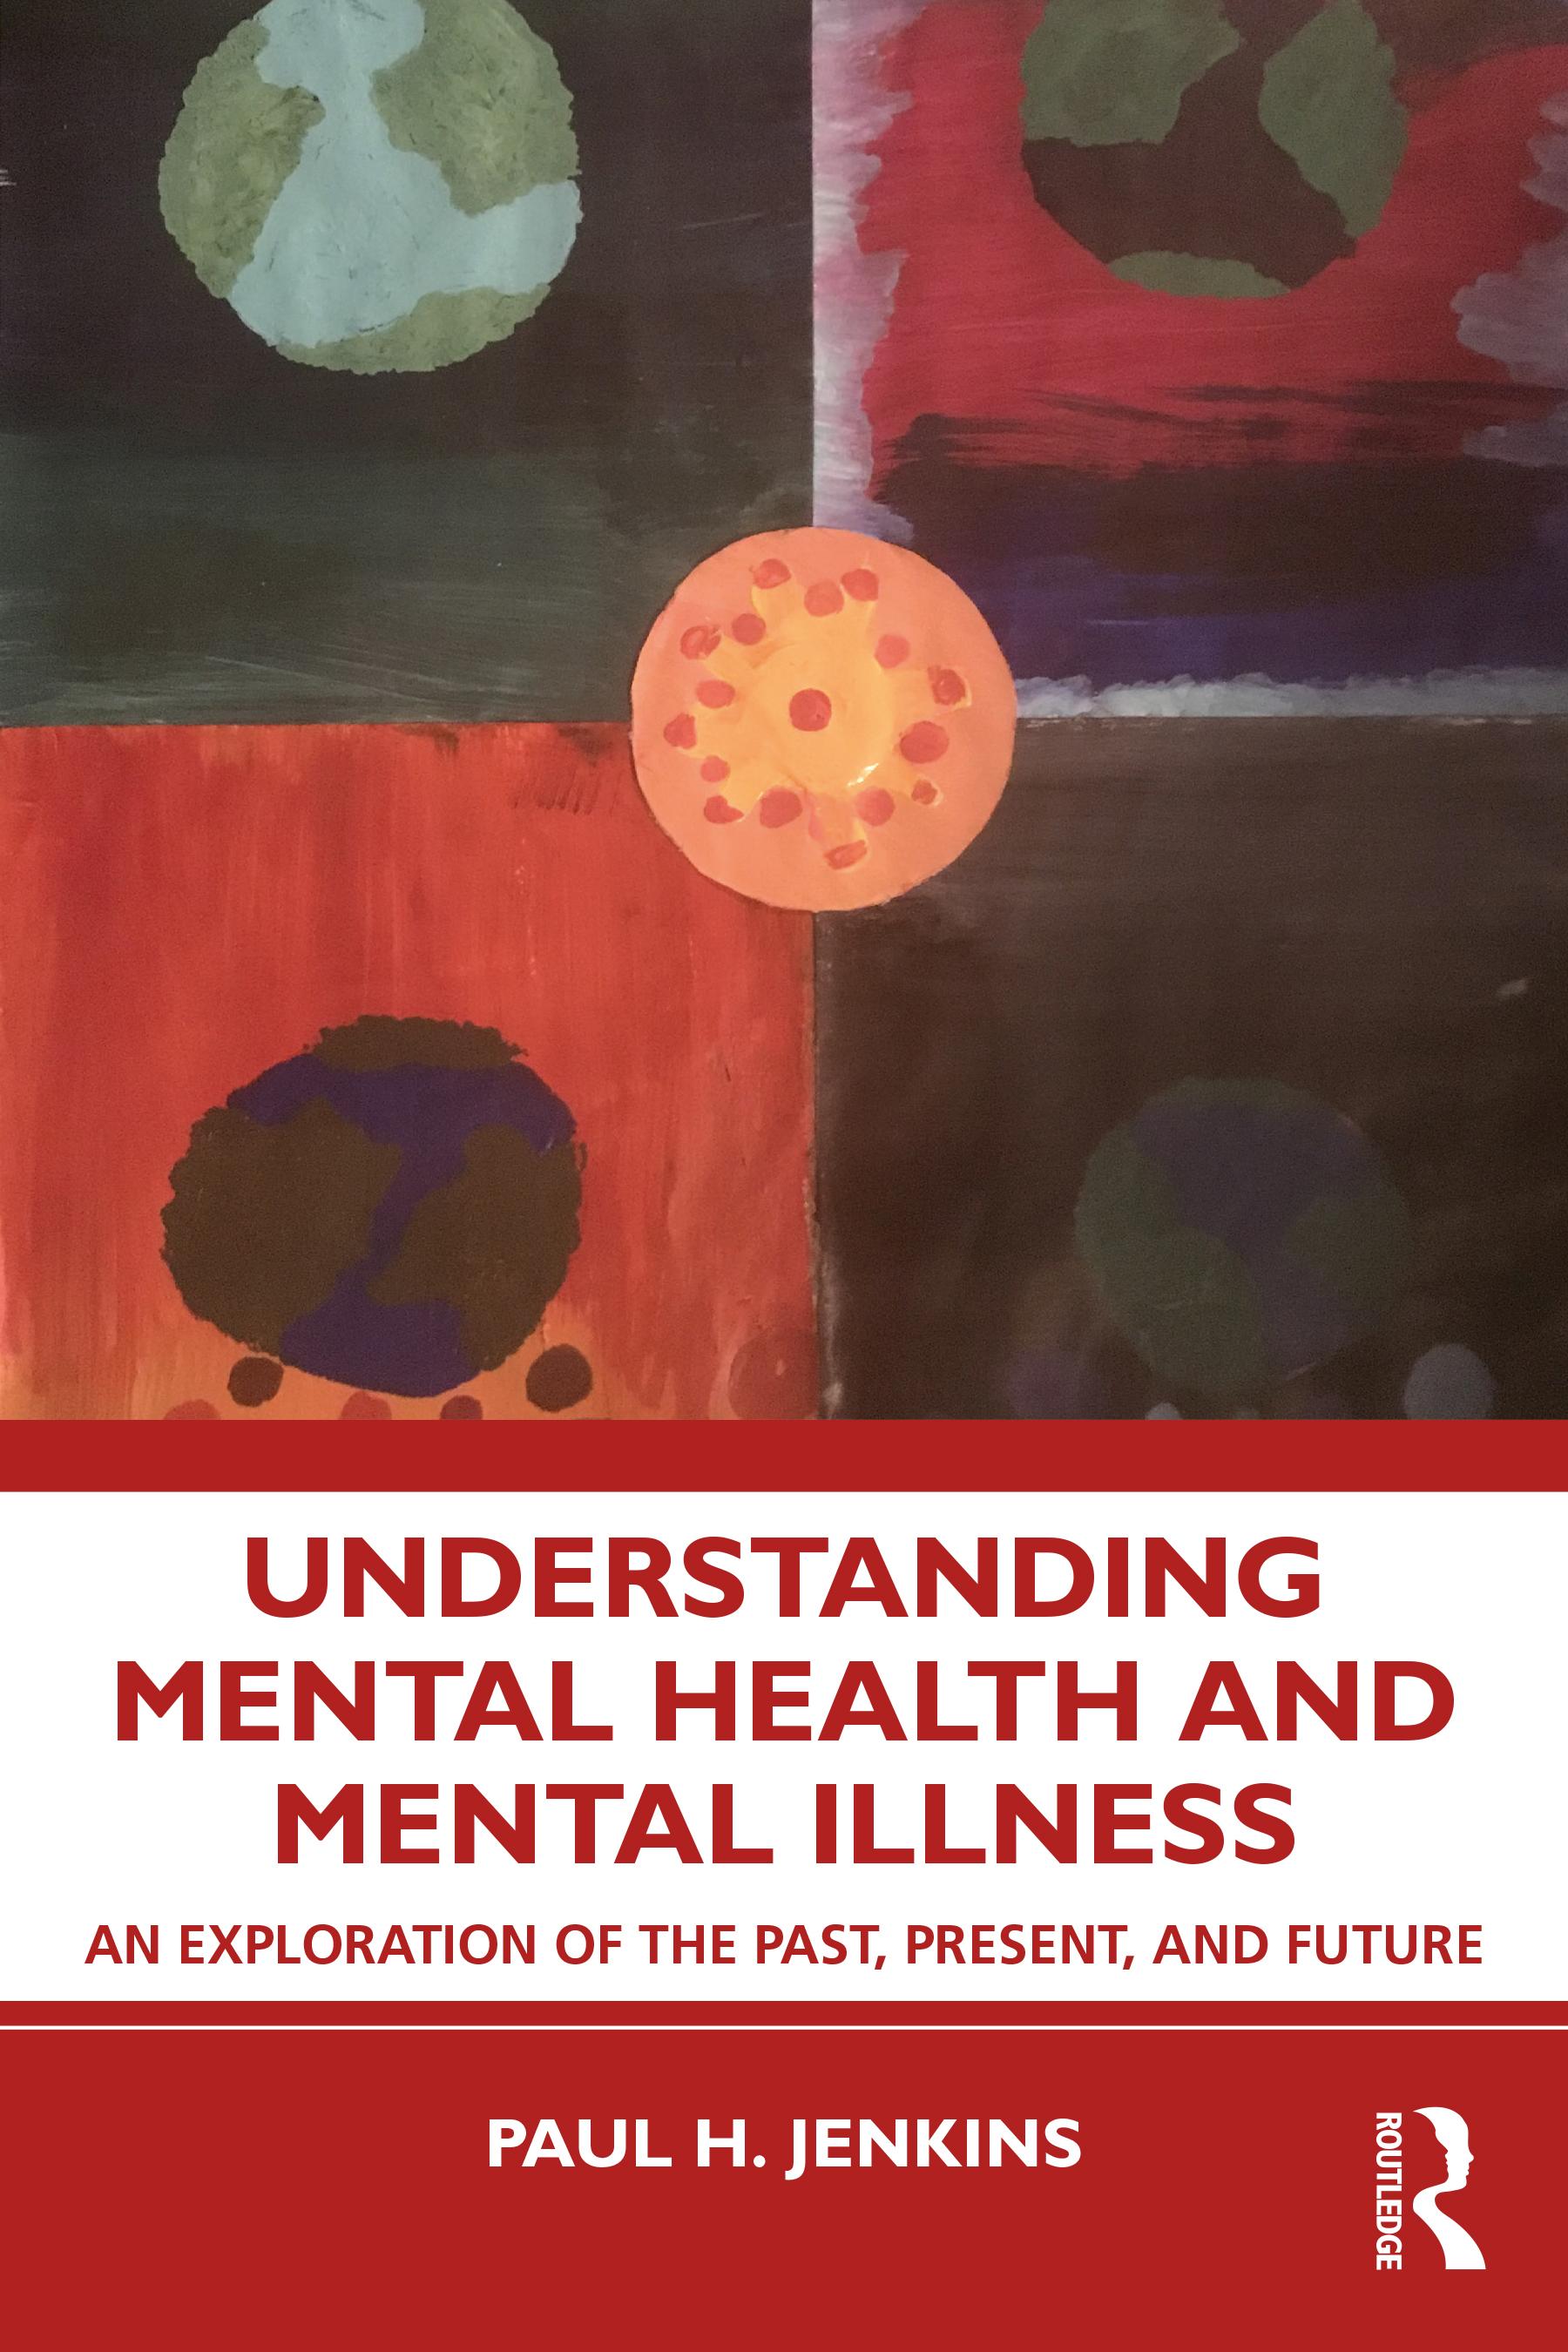 Understanding Mental Health and Mental Illness